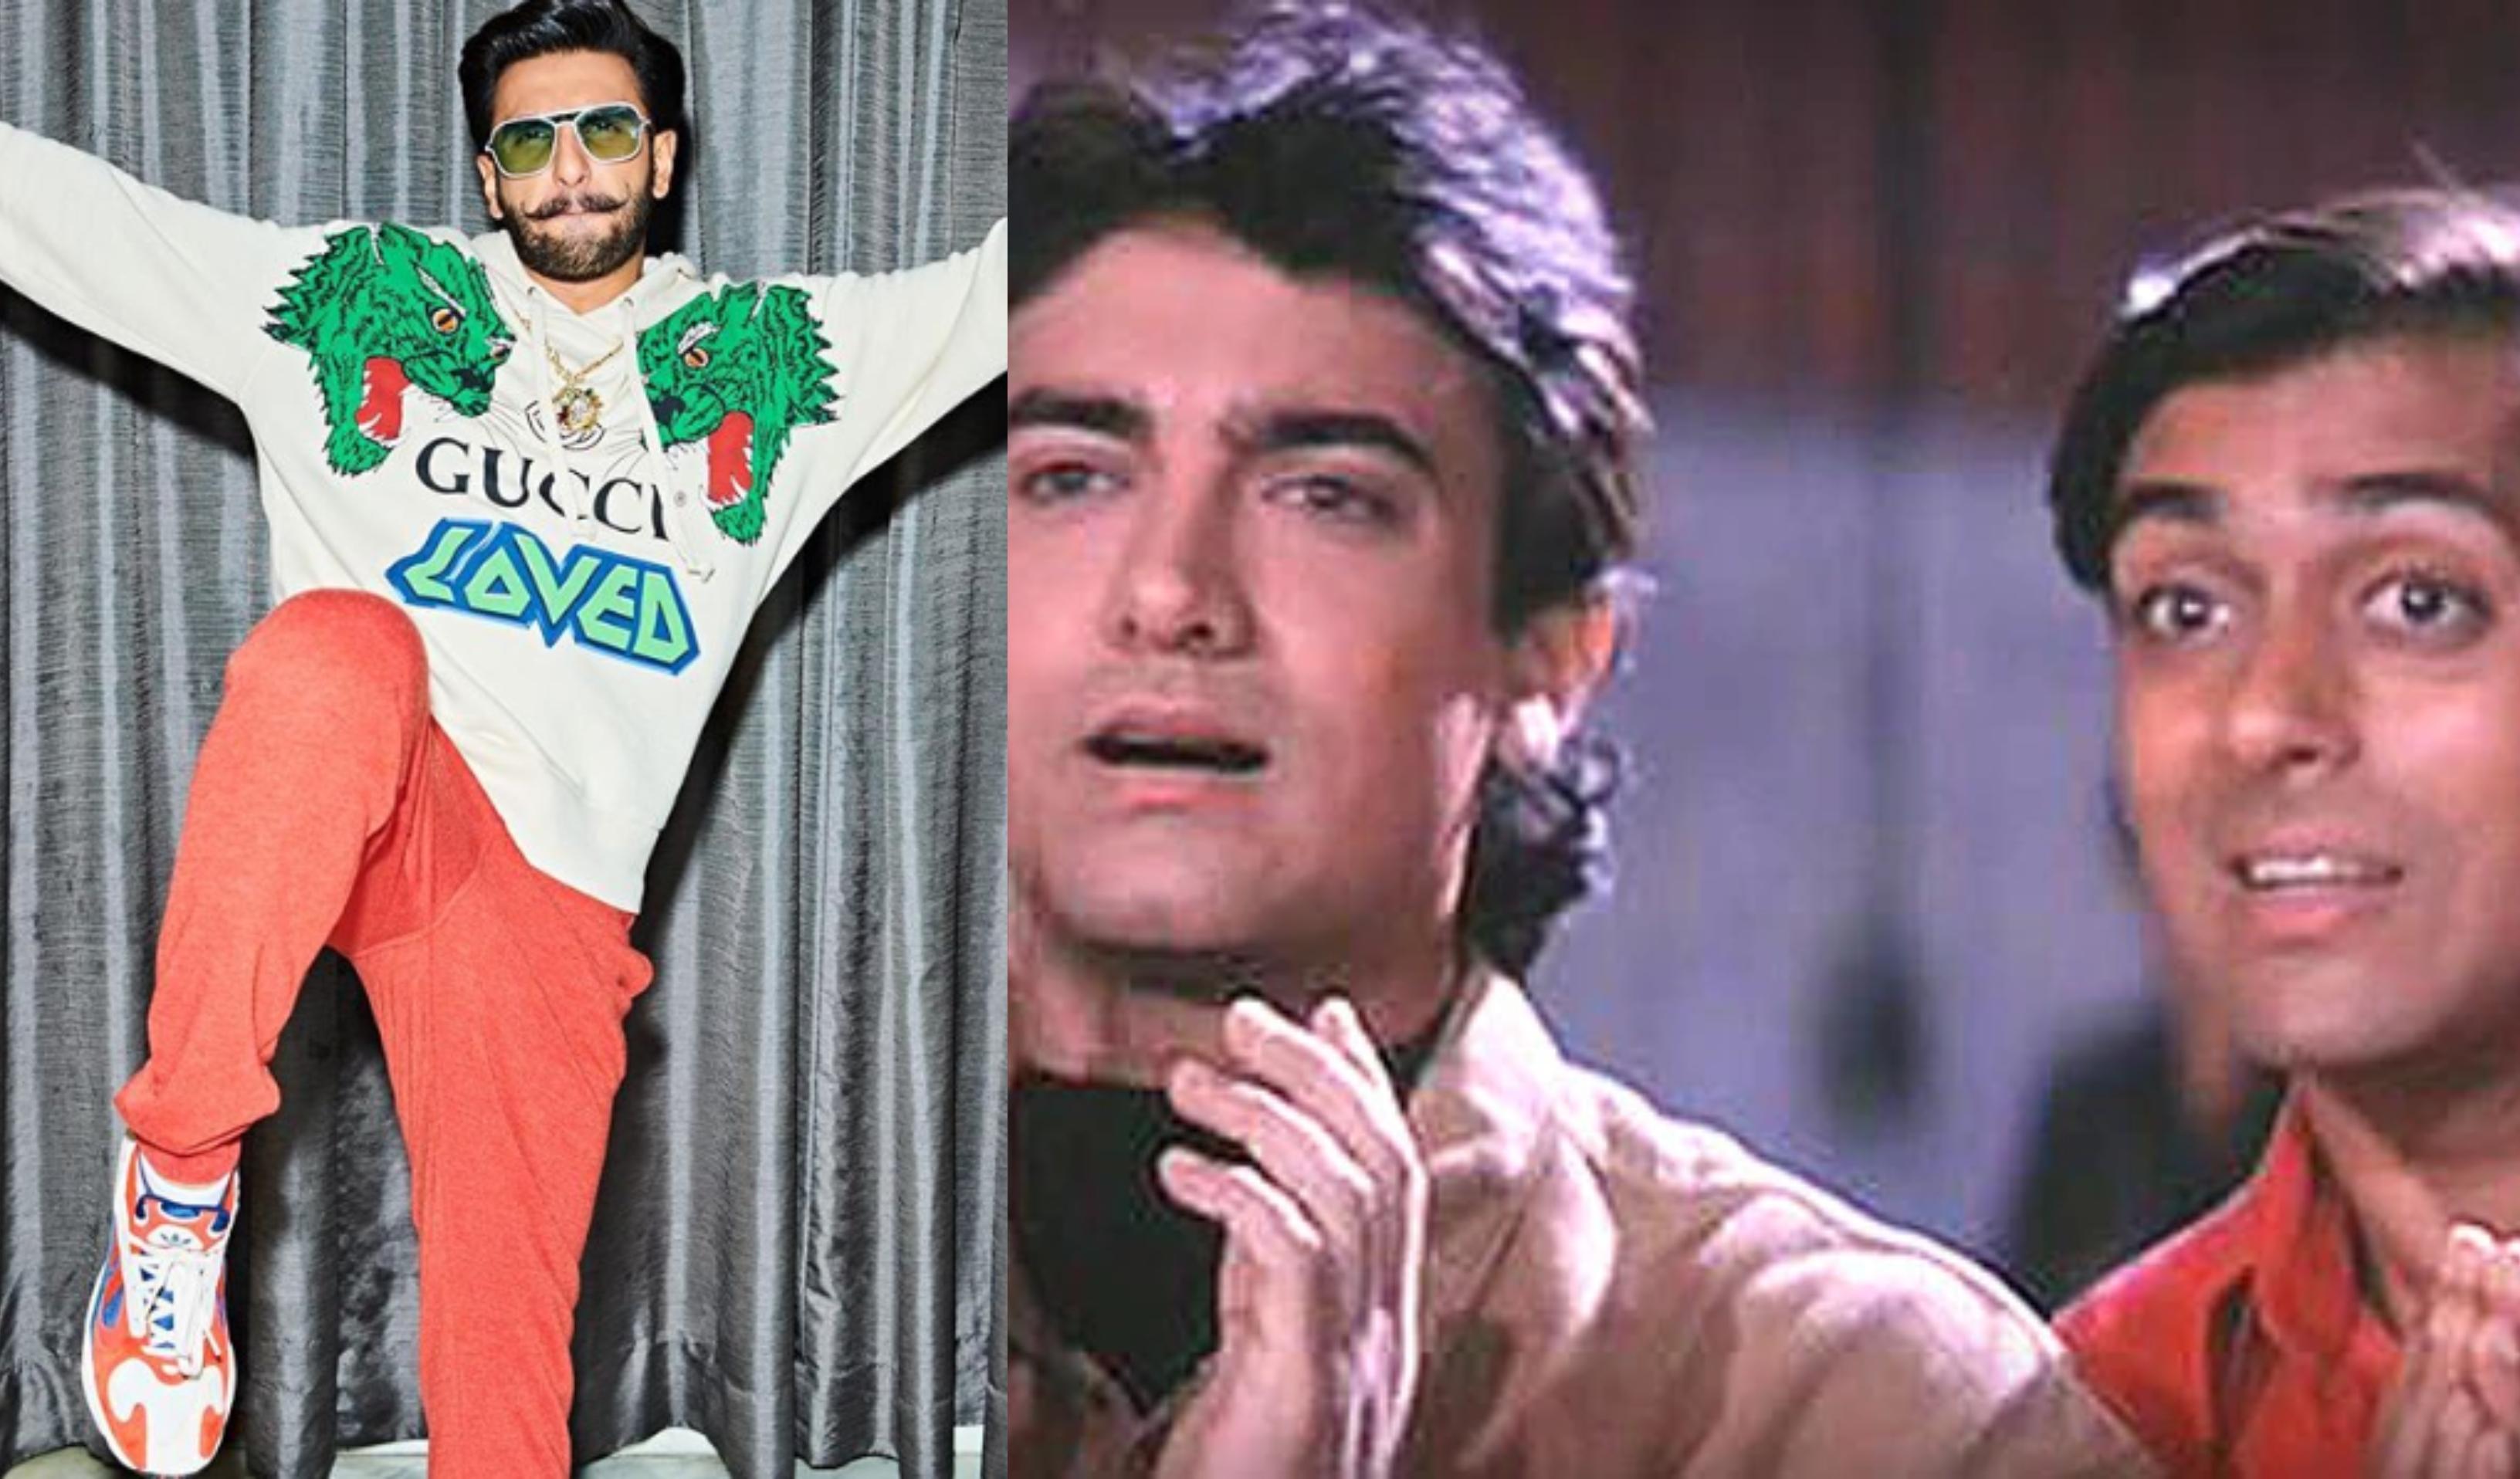 Andaz Apna Apna, Ranveer Singh, Simmba, Movie, Remake, Film, Salman Khan, Aamir Khan, NewsMobile, Mobile, News, India, Entertainment